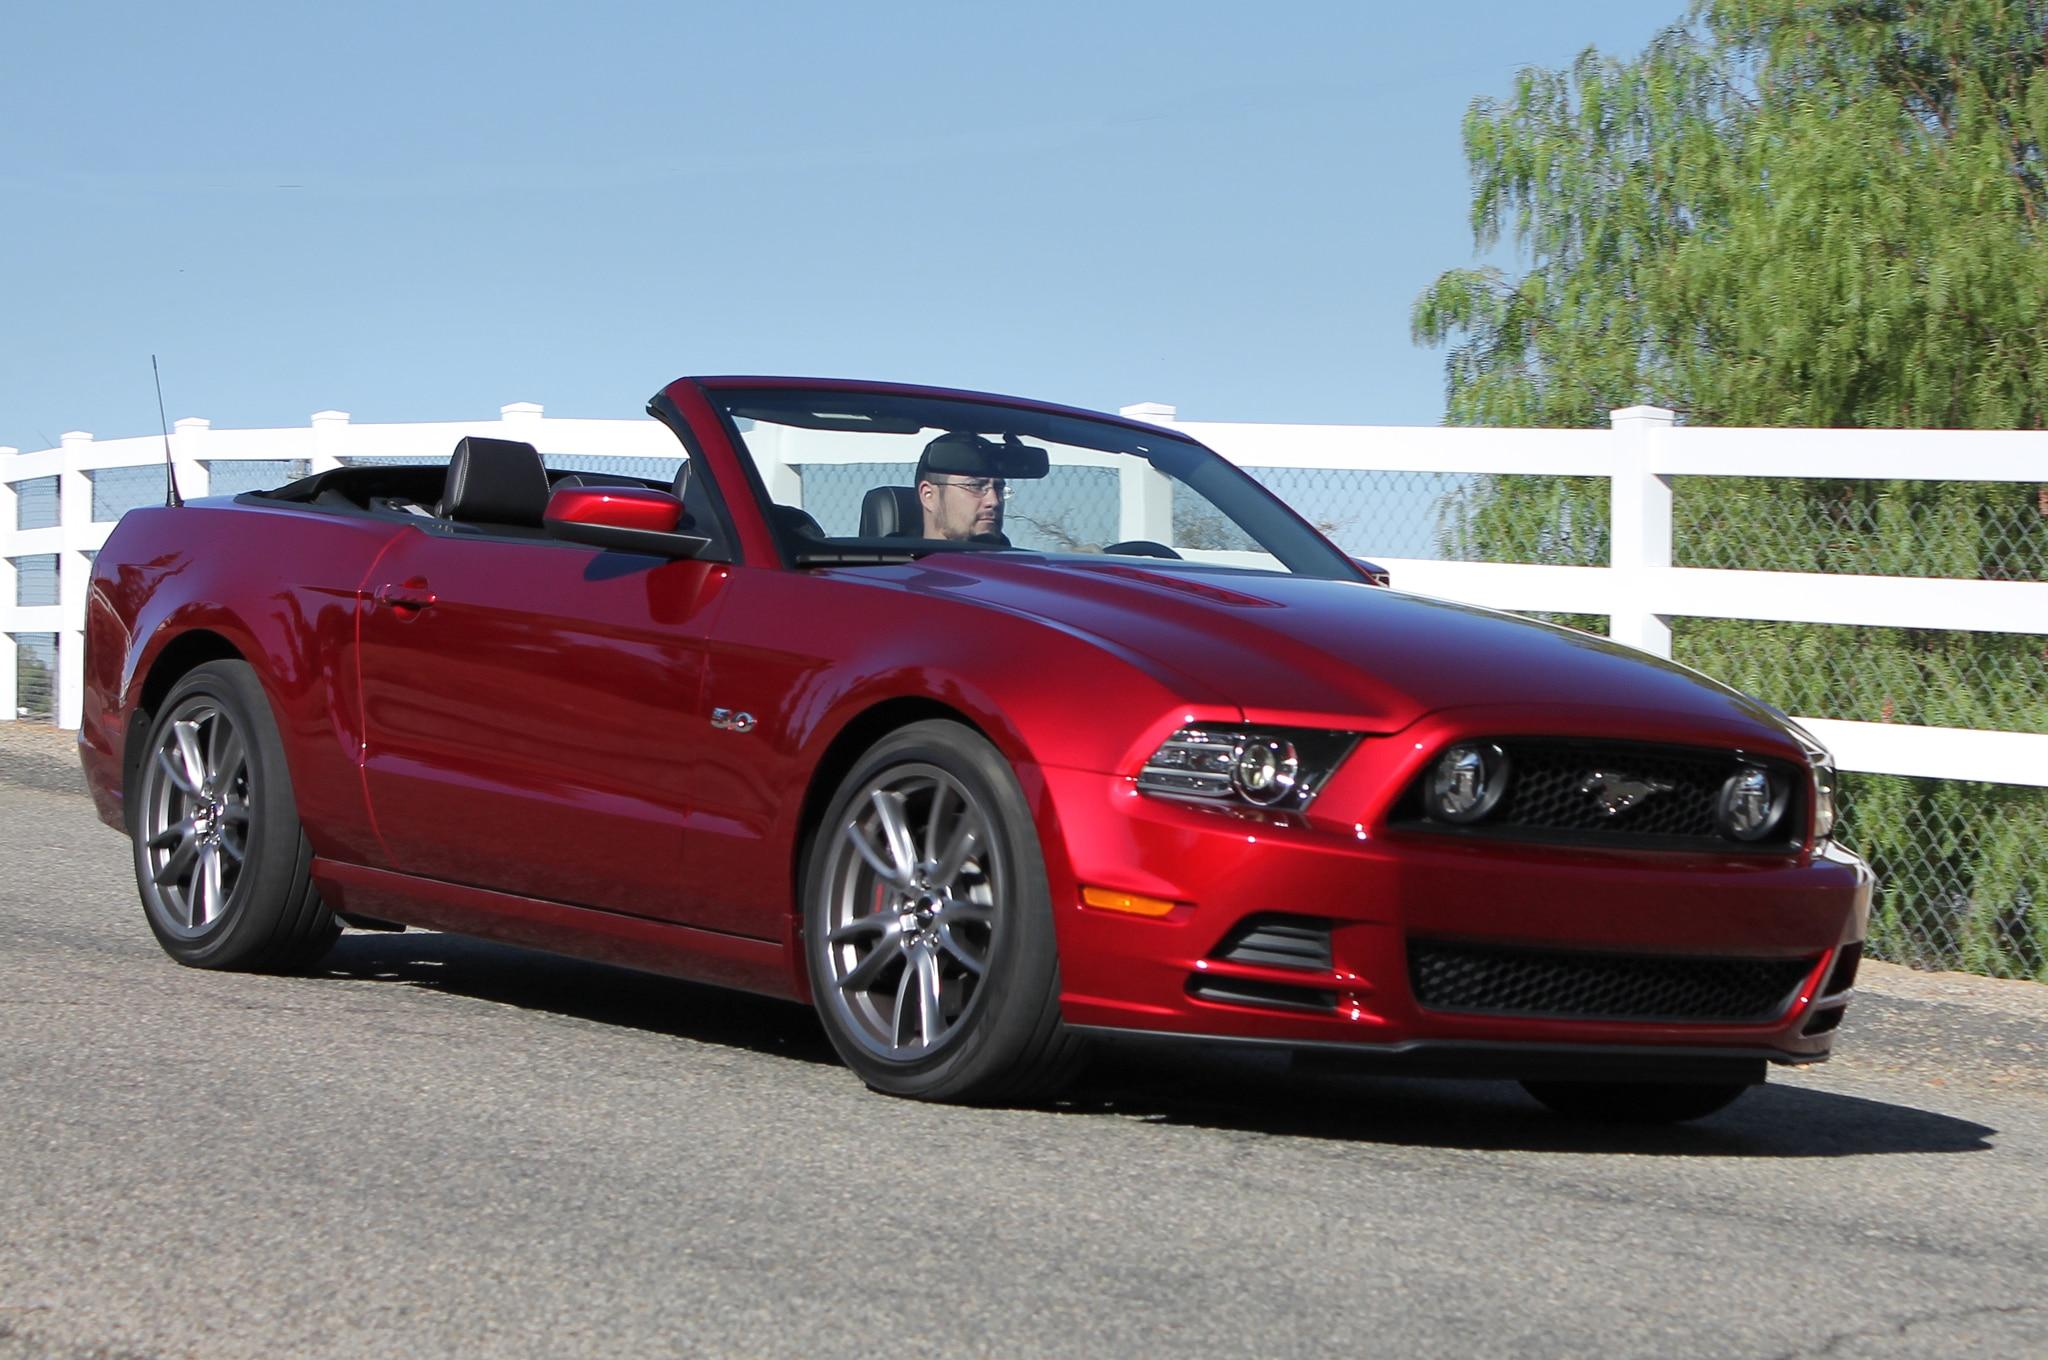 Ford Mustang convertible 2014: Primera Prueba - Autos ...